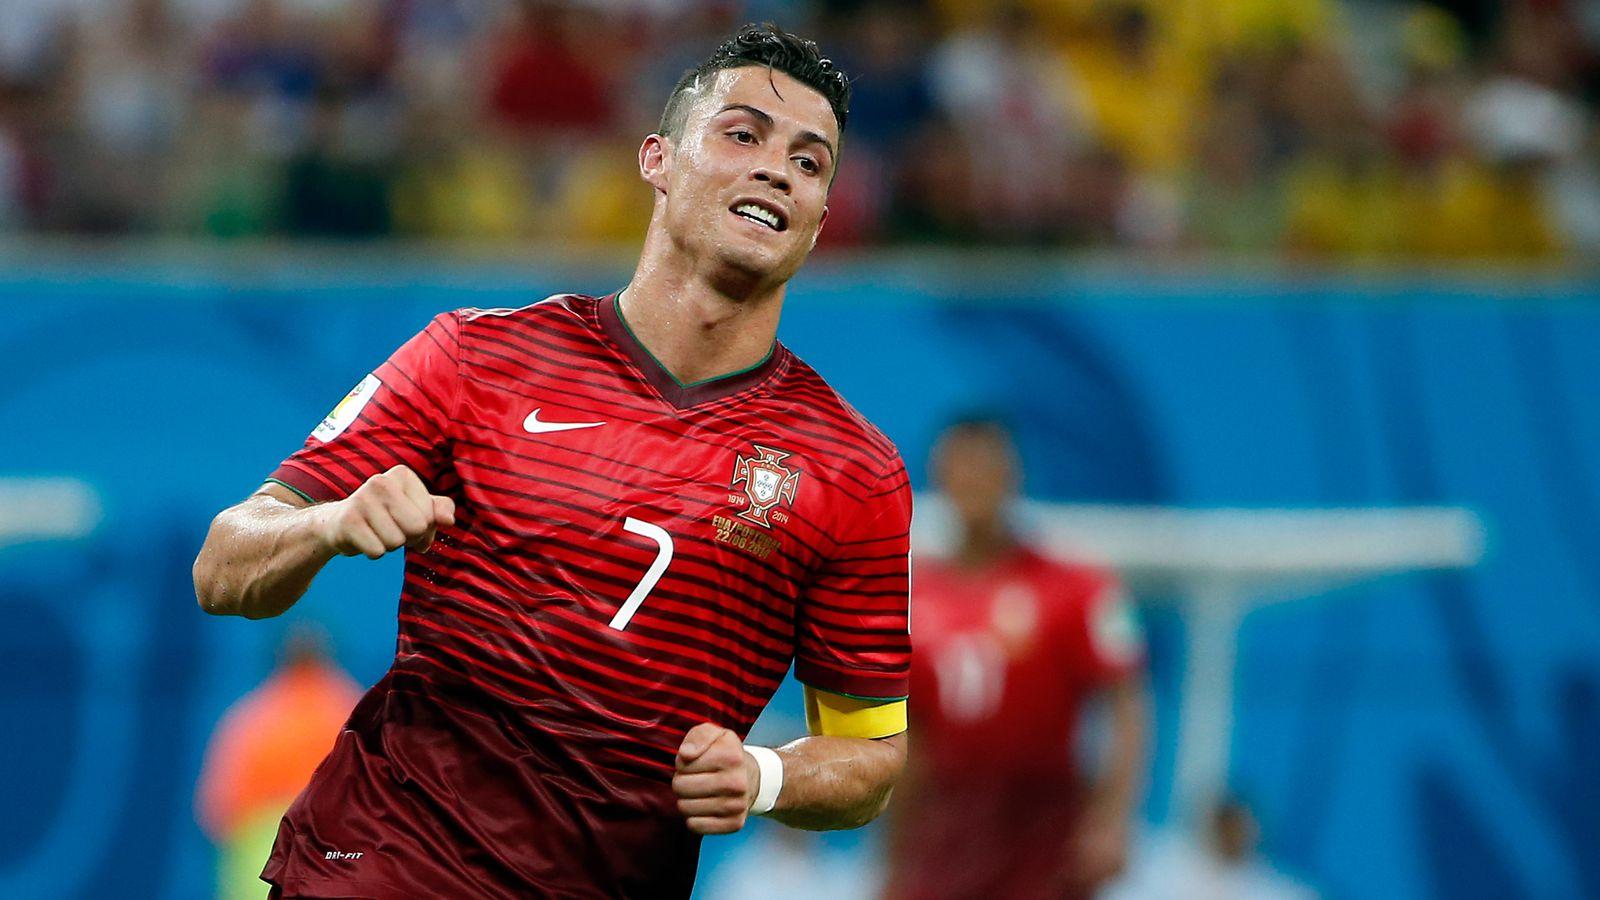 Portugal vs. Armenia: Final score 1-0, Ronaldo saves Portugal with a late goal - SBNation.com